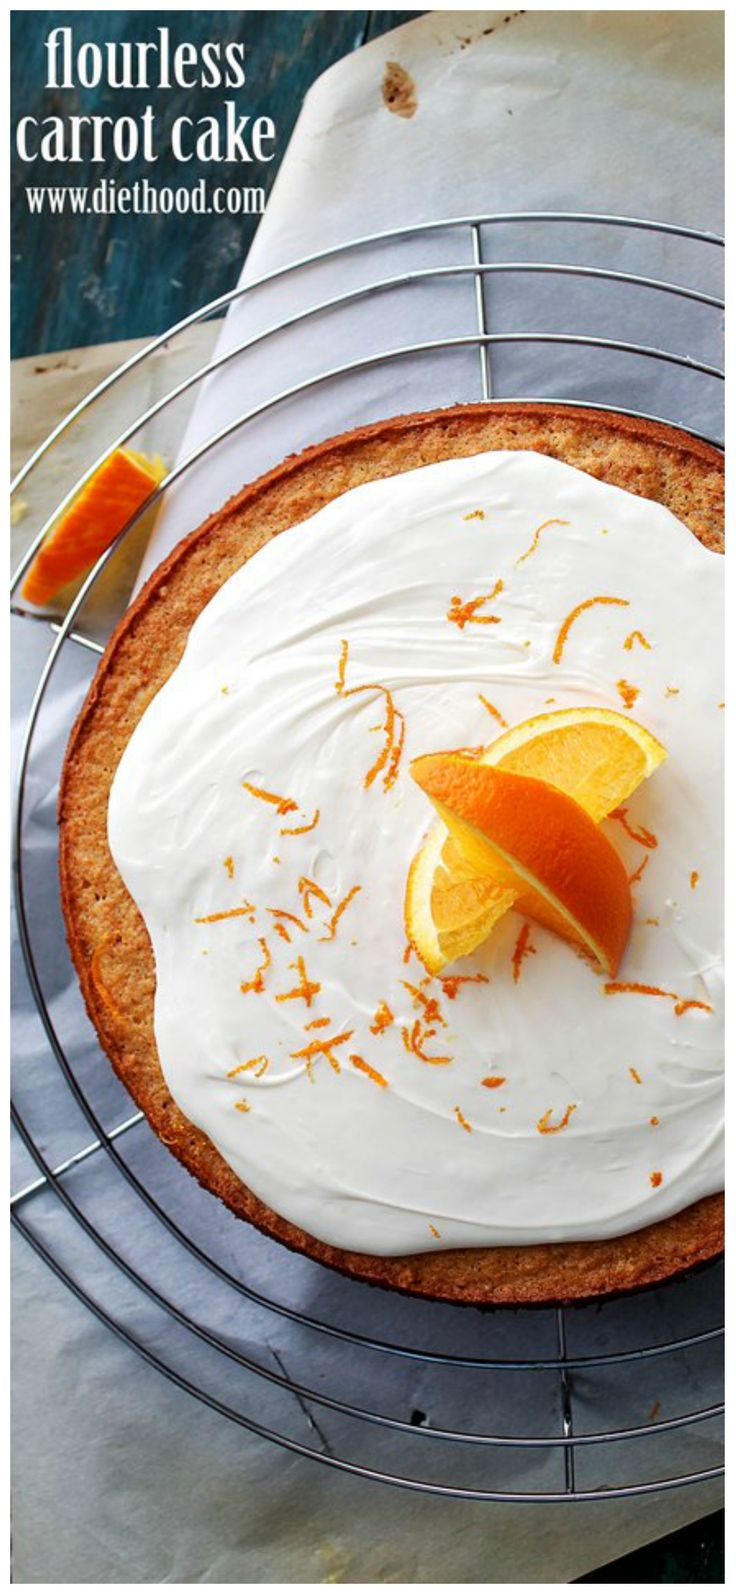 ... mascarpone frosting.: Carrot Cakes, Creamy Mascarpone, Mascarpone